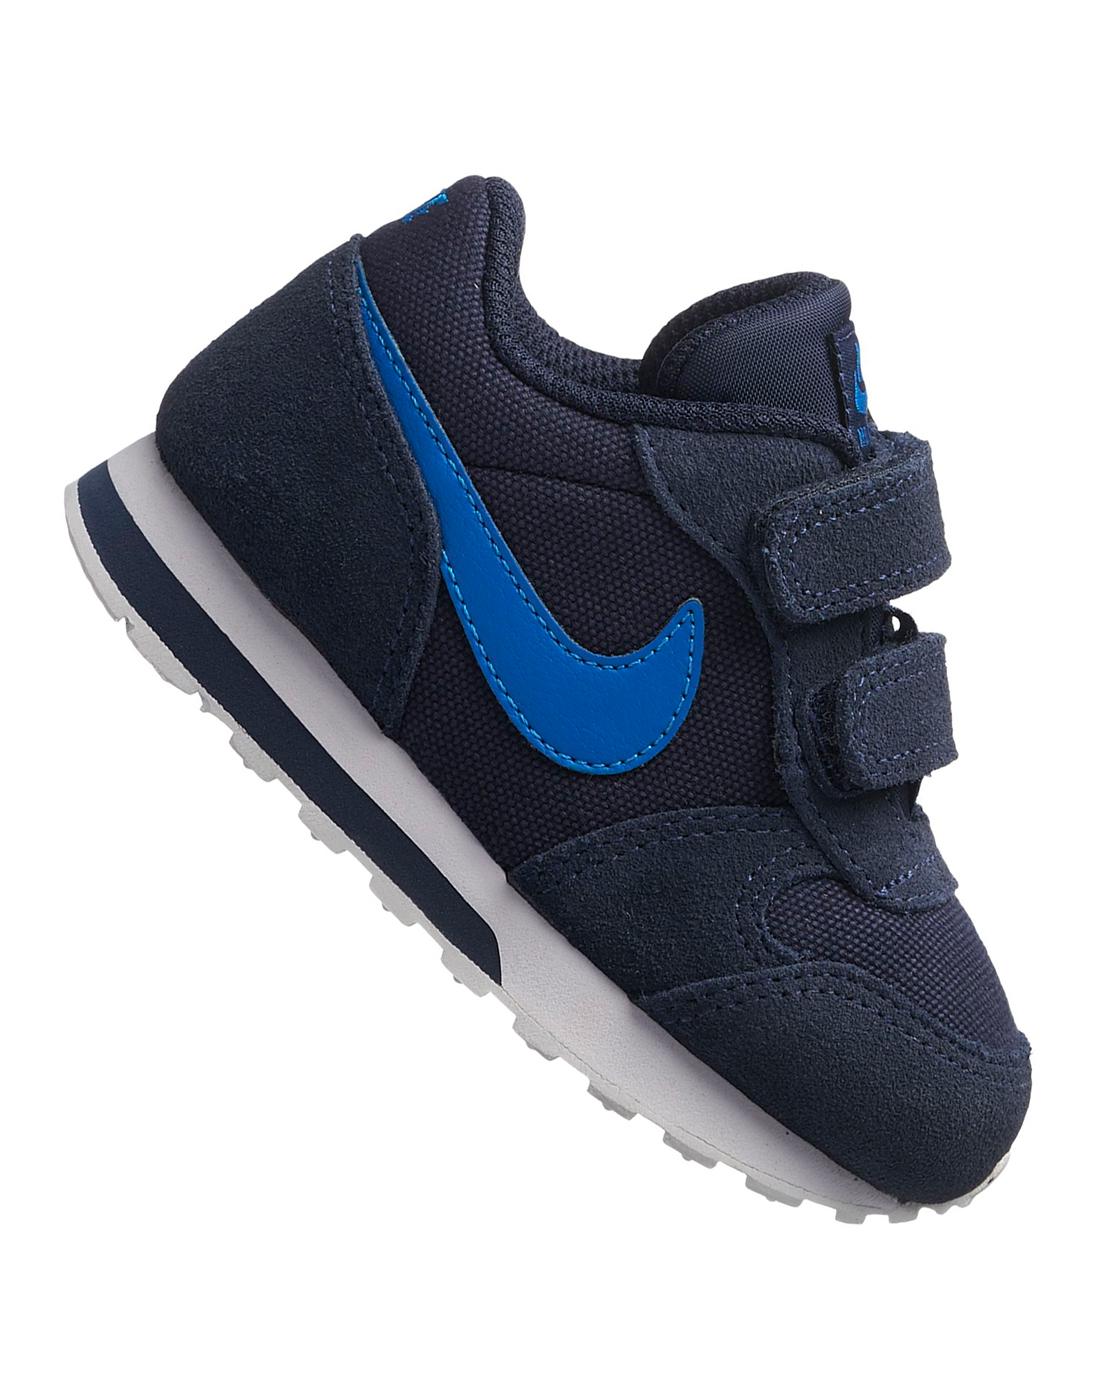 be25dcf067 Nike Infant Boys MD Runner | Life Style Sports